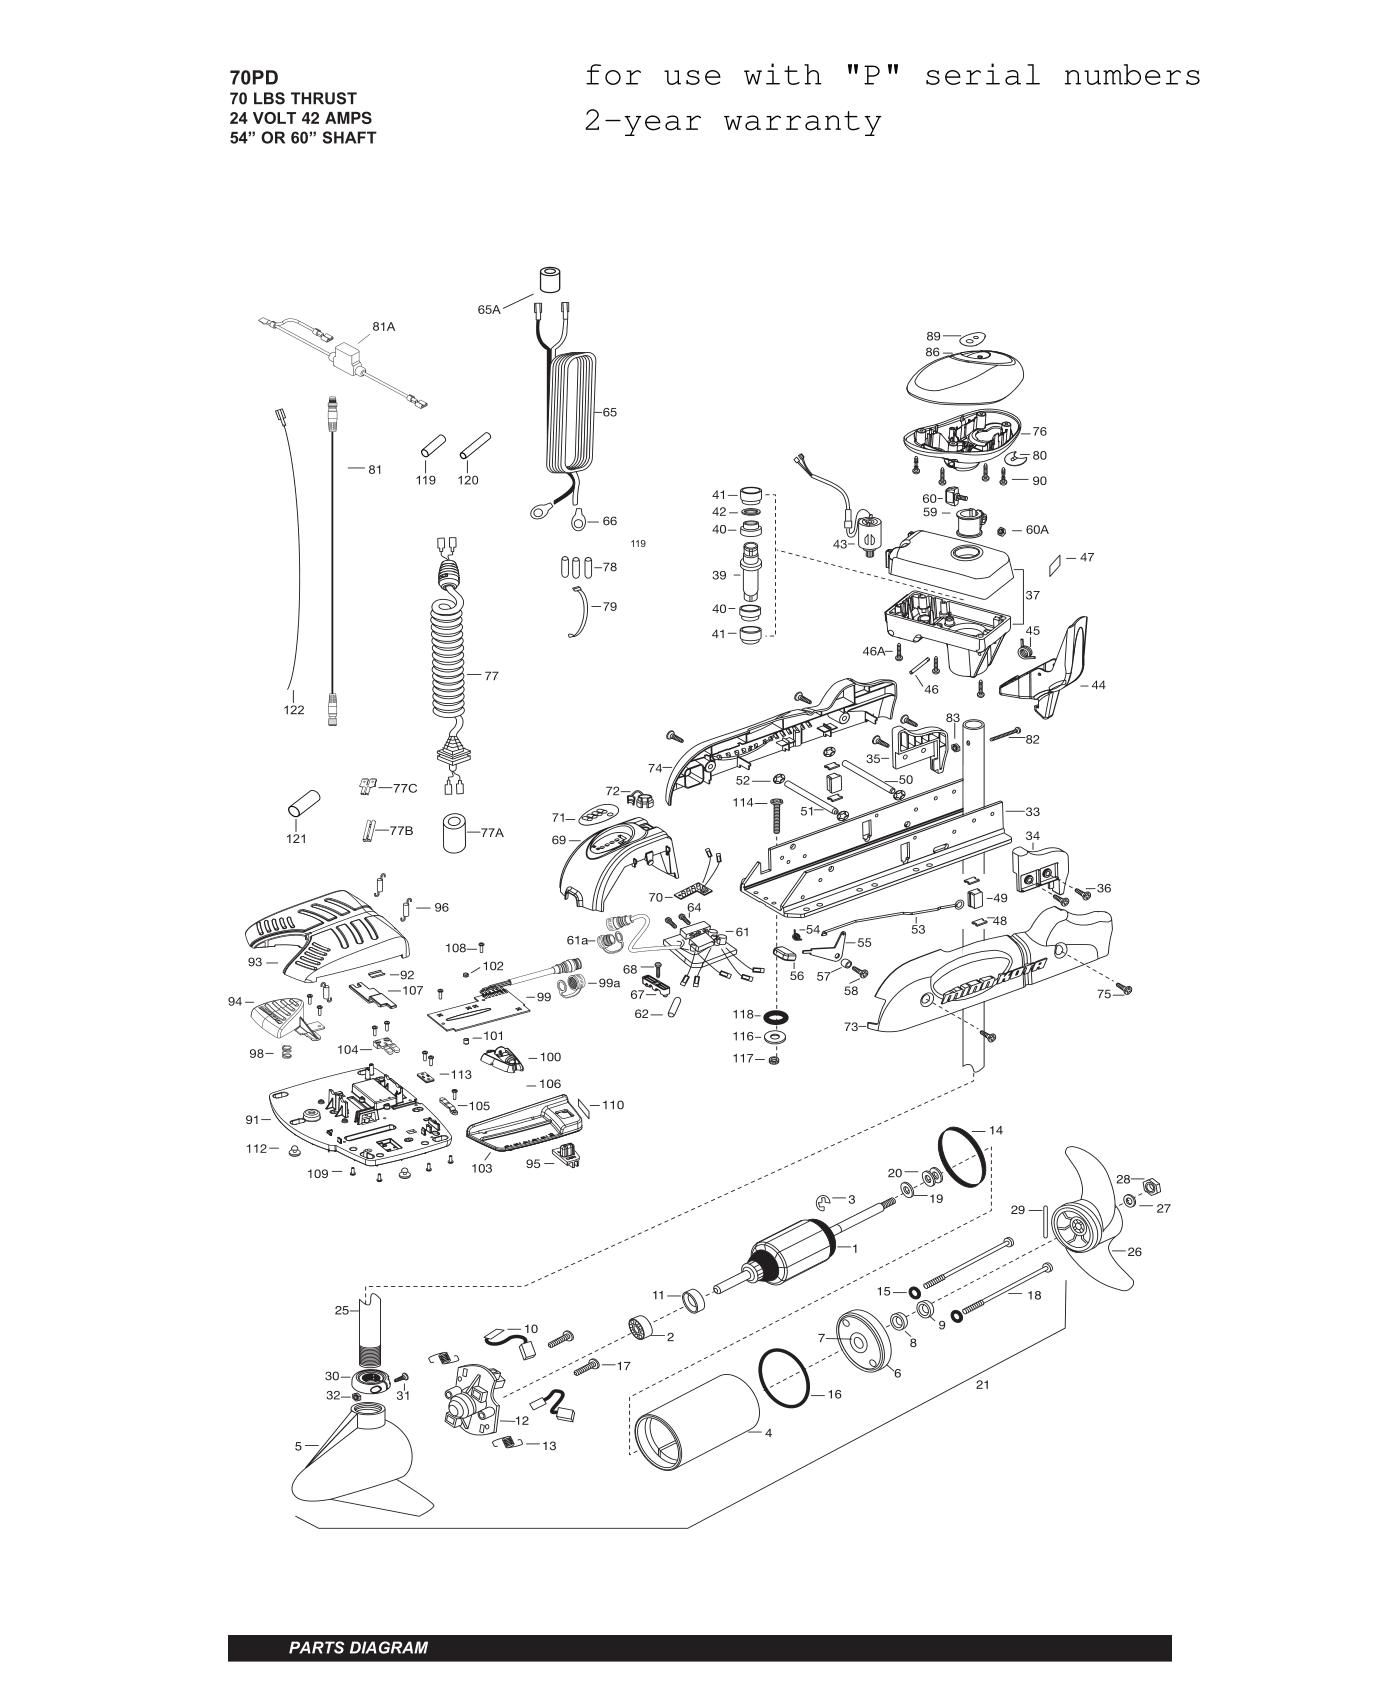 Minn Kota Powerdrive V2 70 Parts